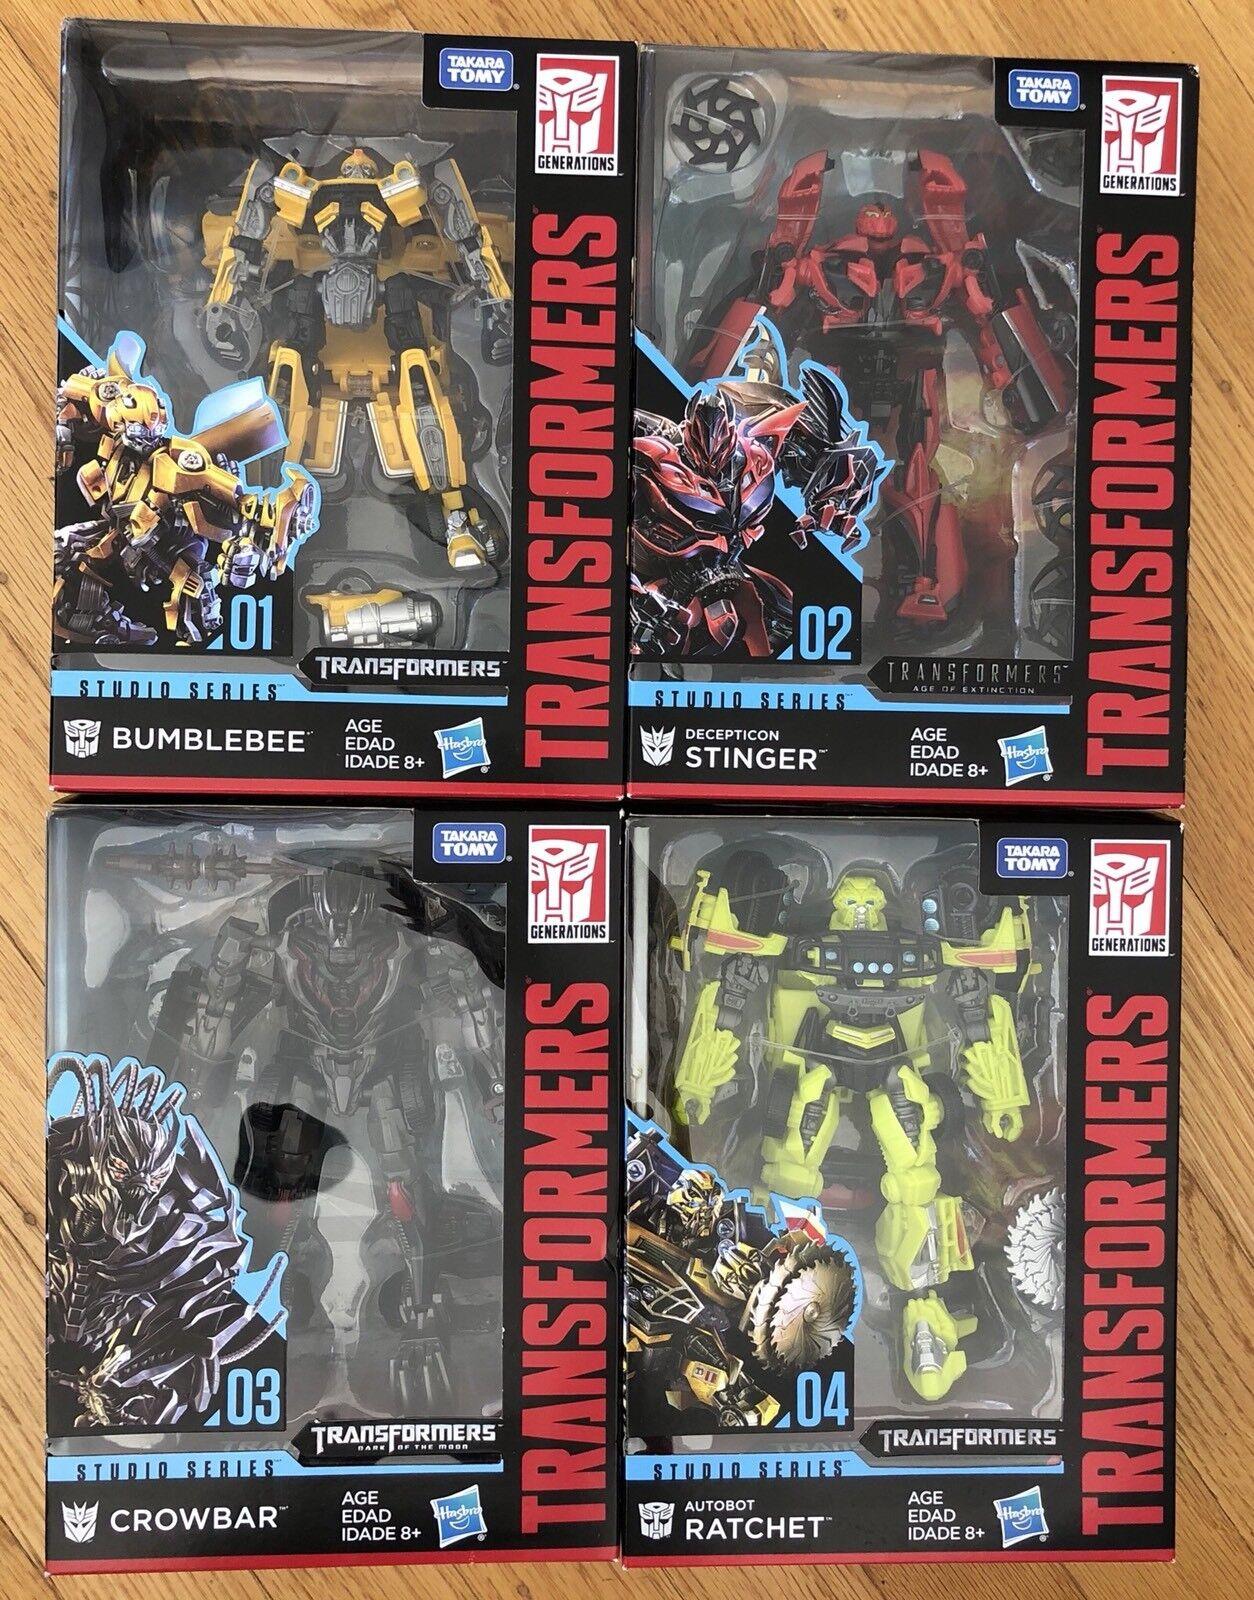 Transformers Studio Series Wave 1 Bumblebee Stinger Ratchet Crowbar